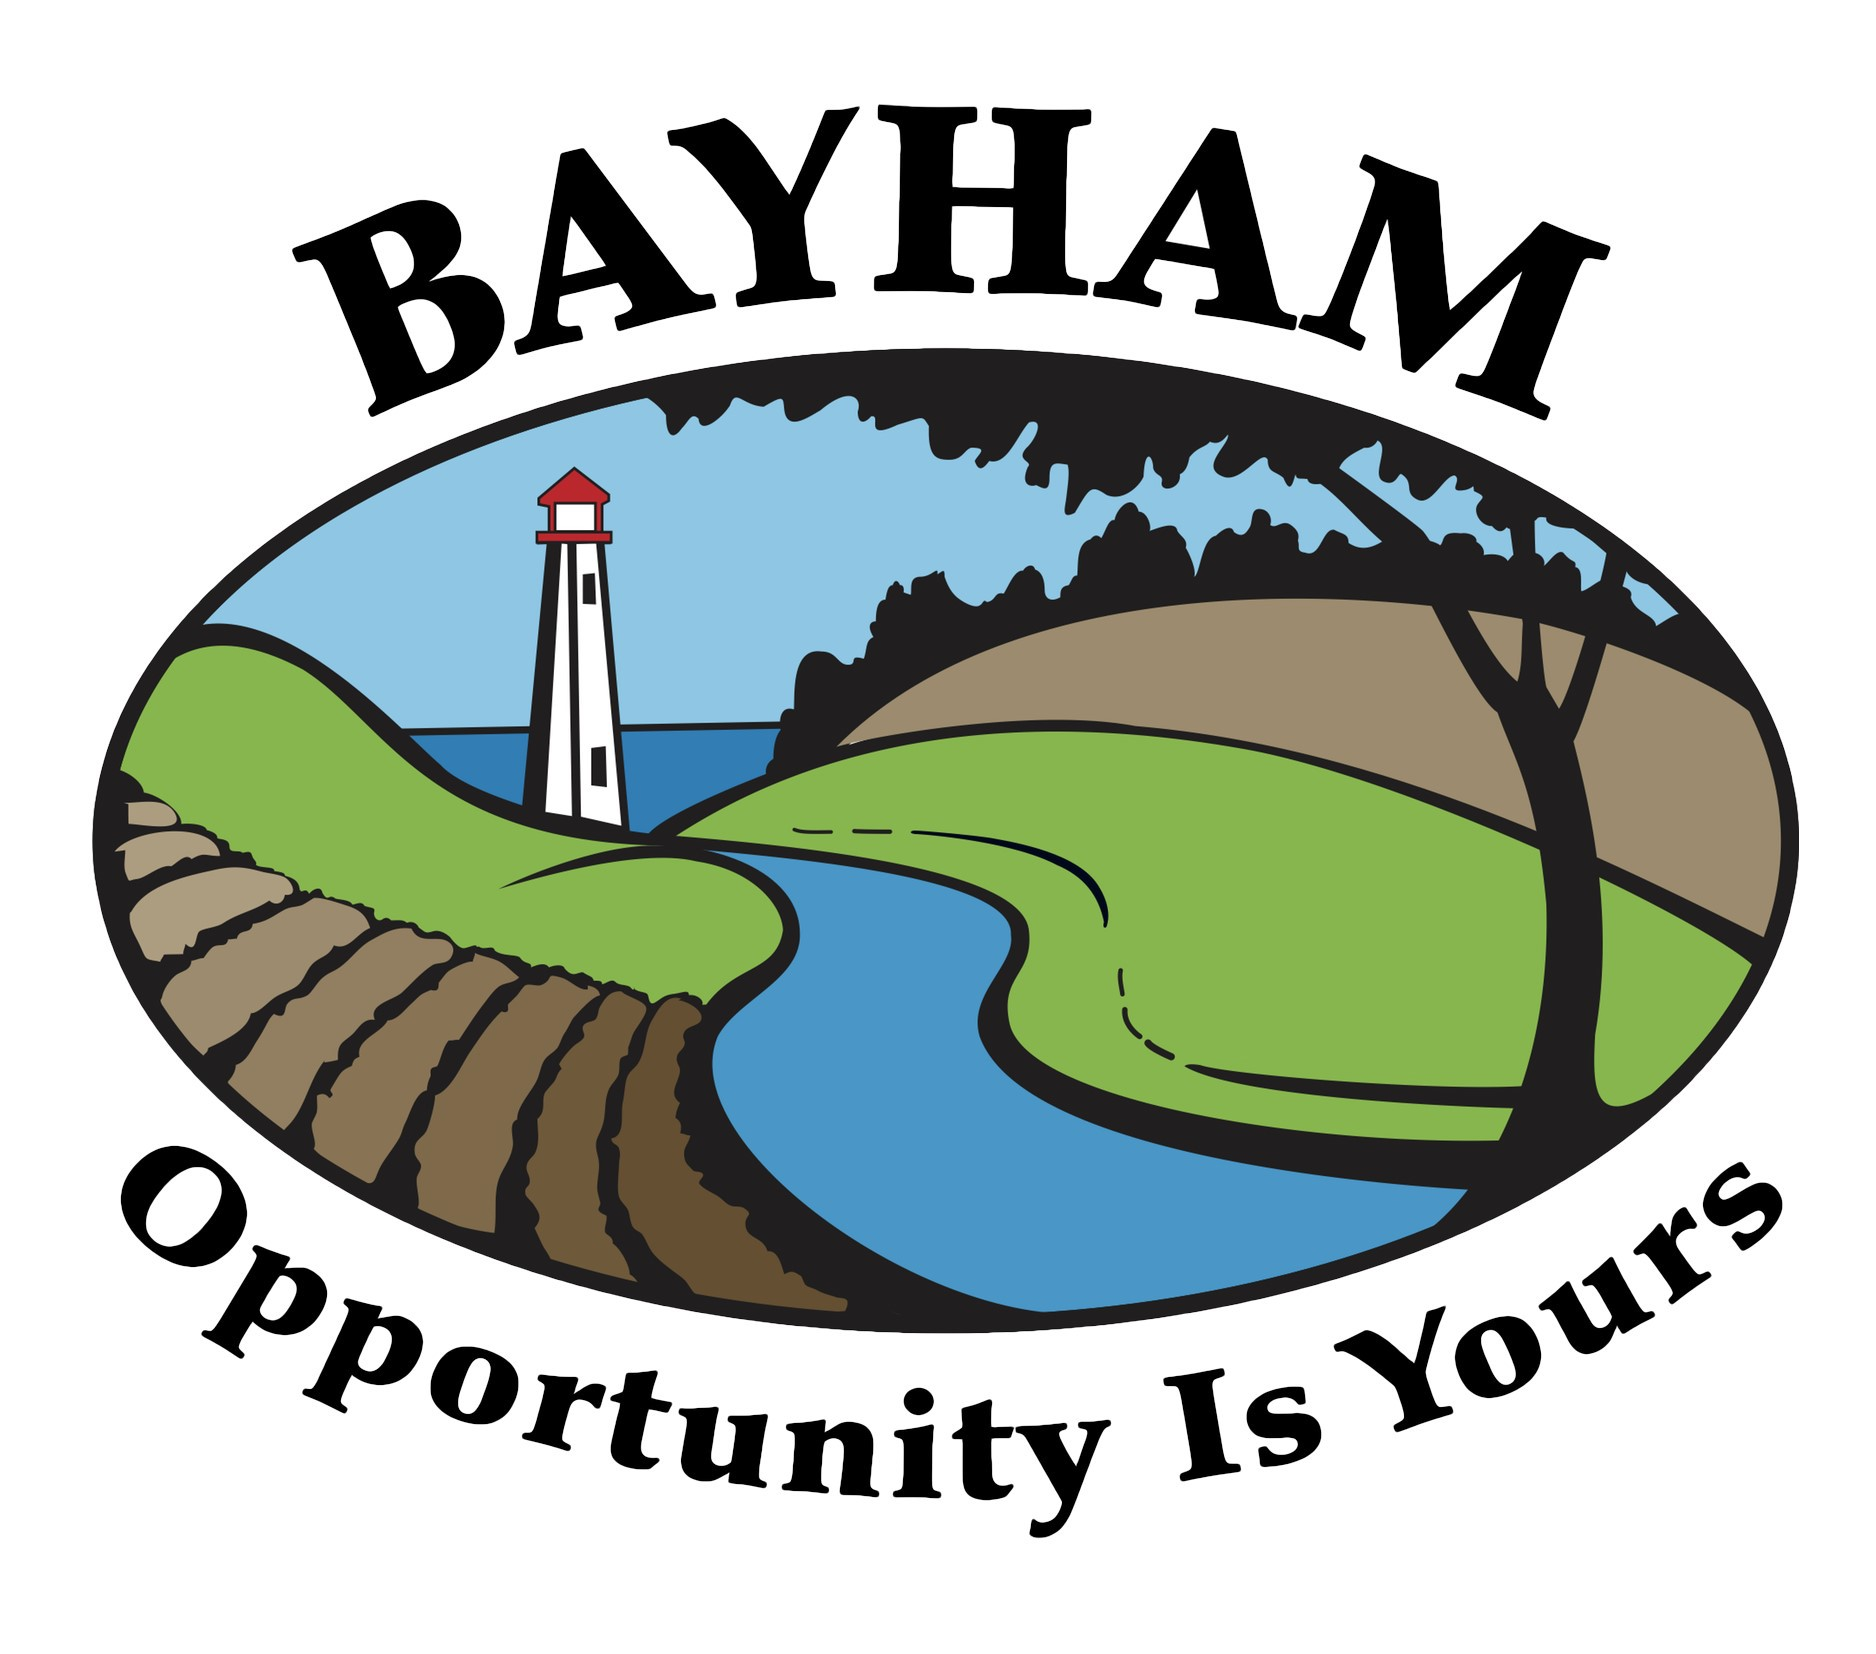 Municipality of Bayham